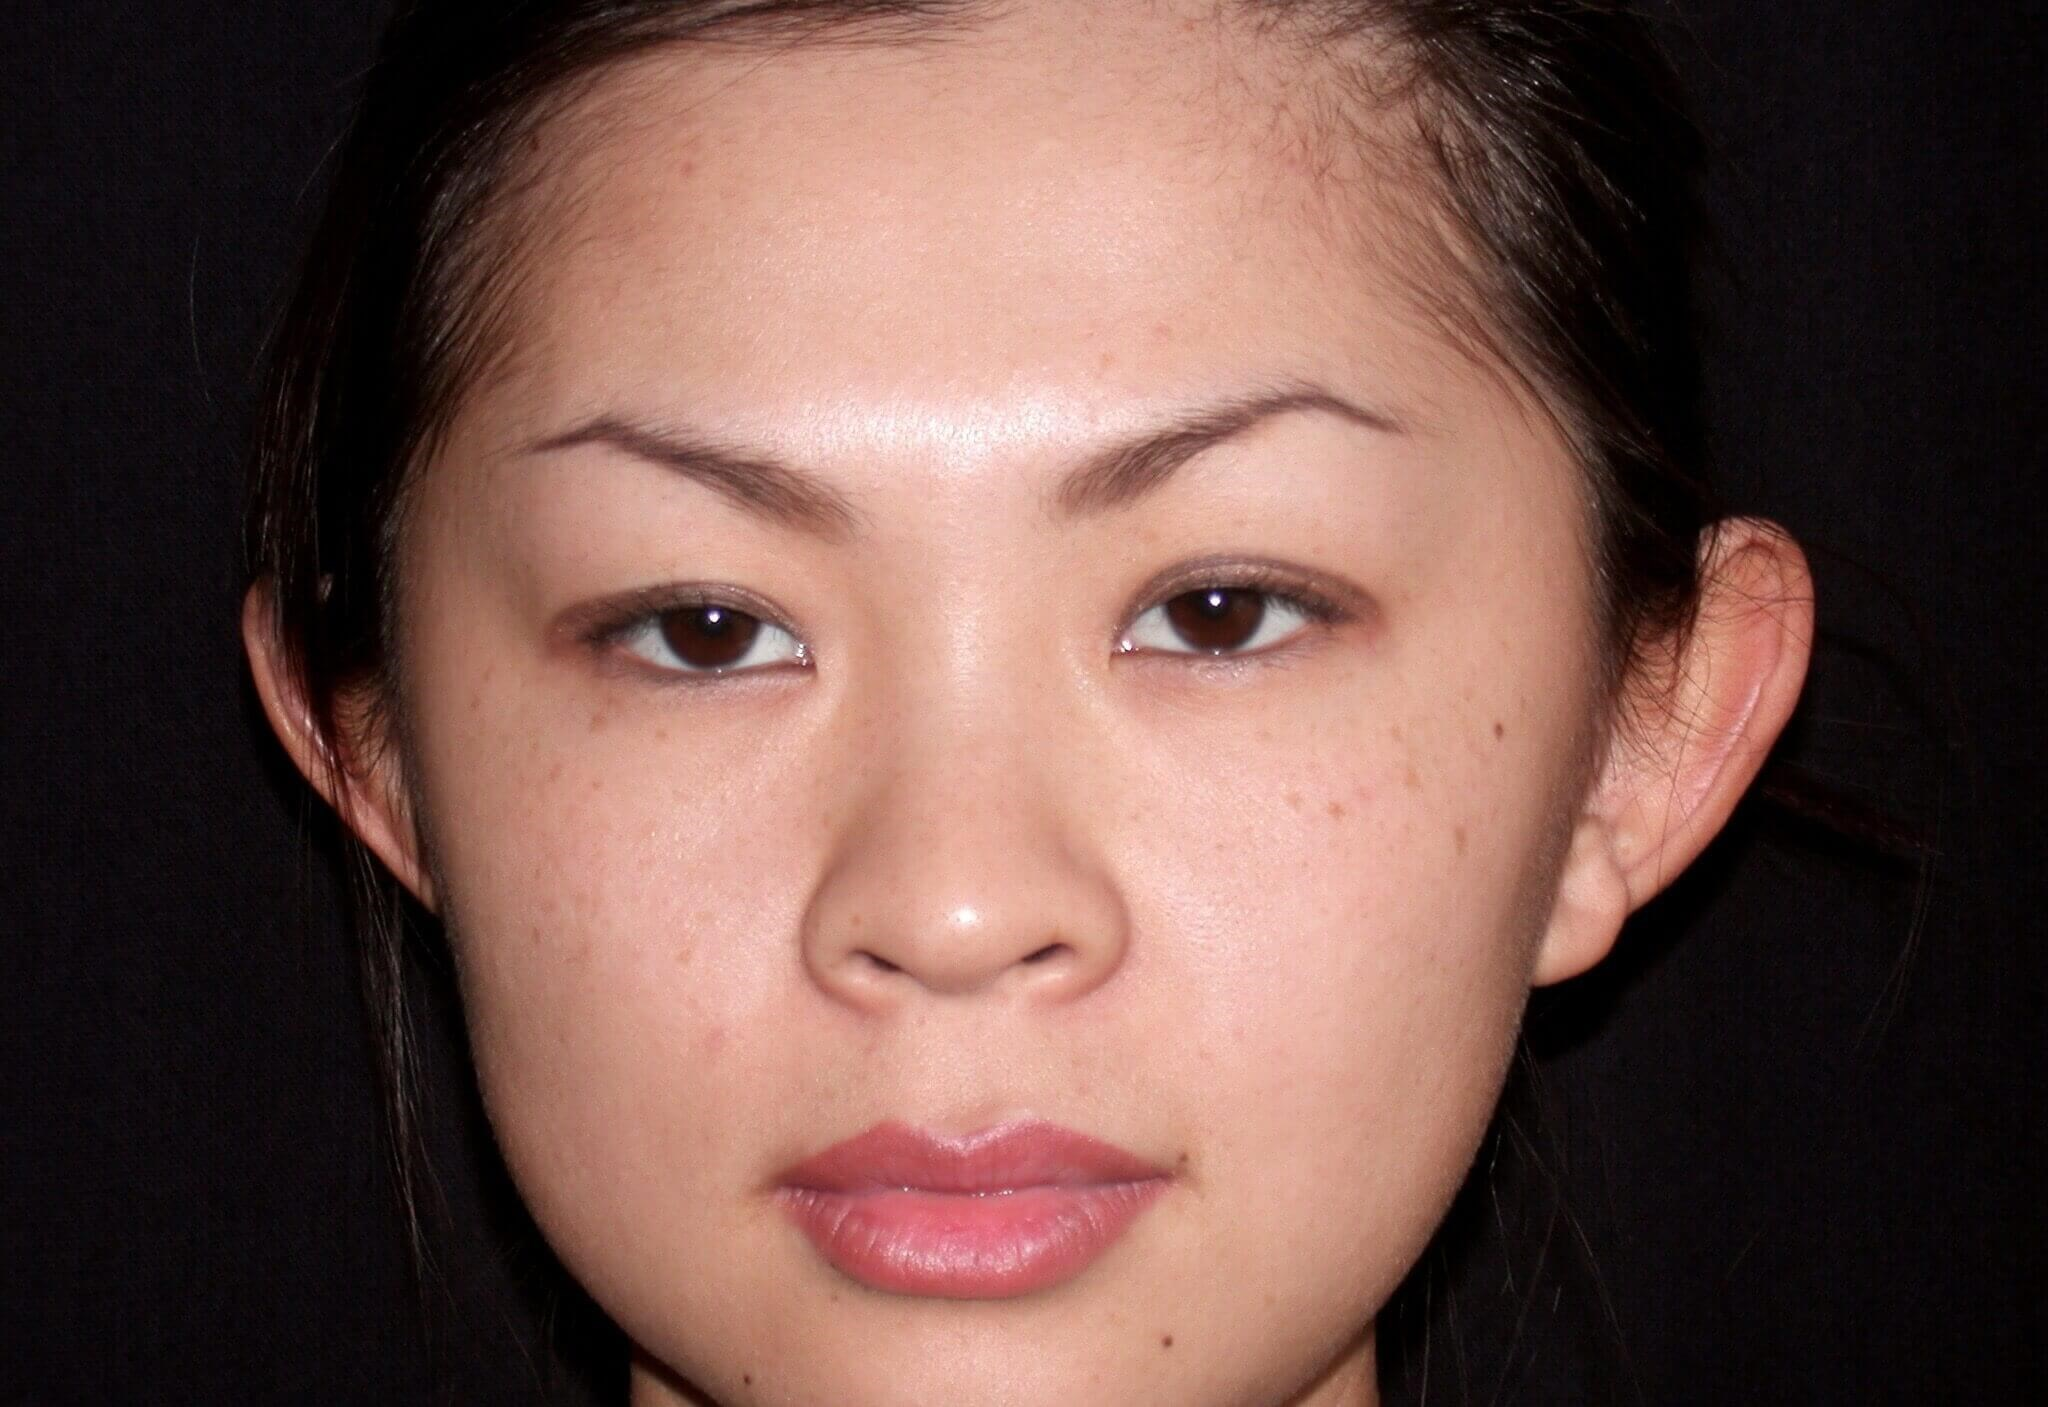 DALLAS, TEXAS WOMAN HAS OTOPLASTY EAR SURGERY